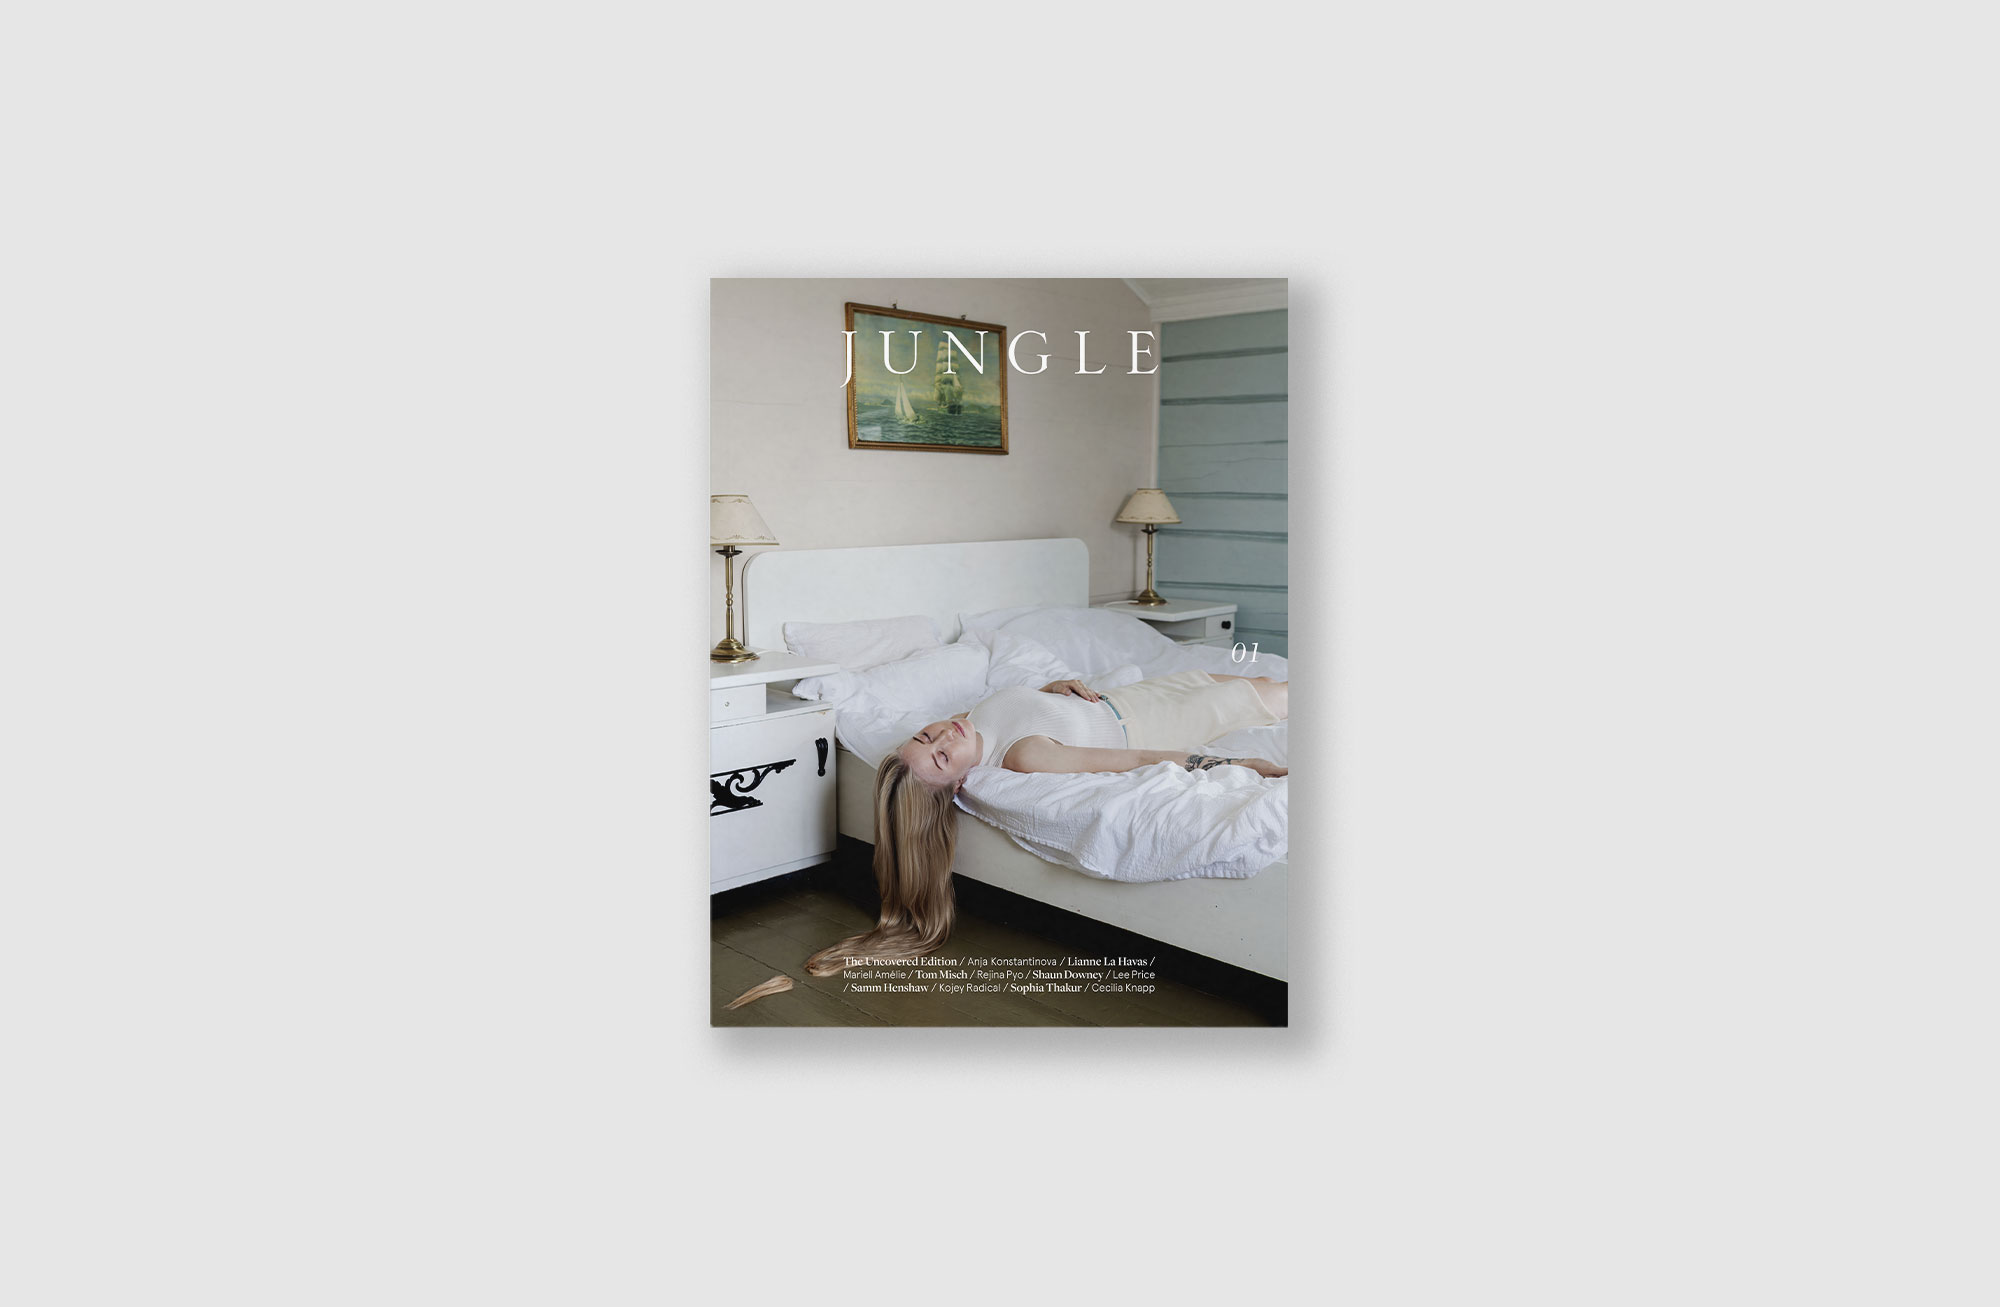 jungle-magazine-01-2.jpg